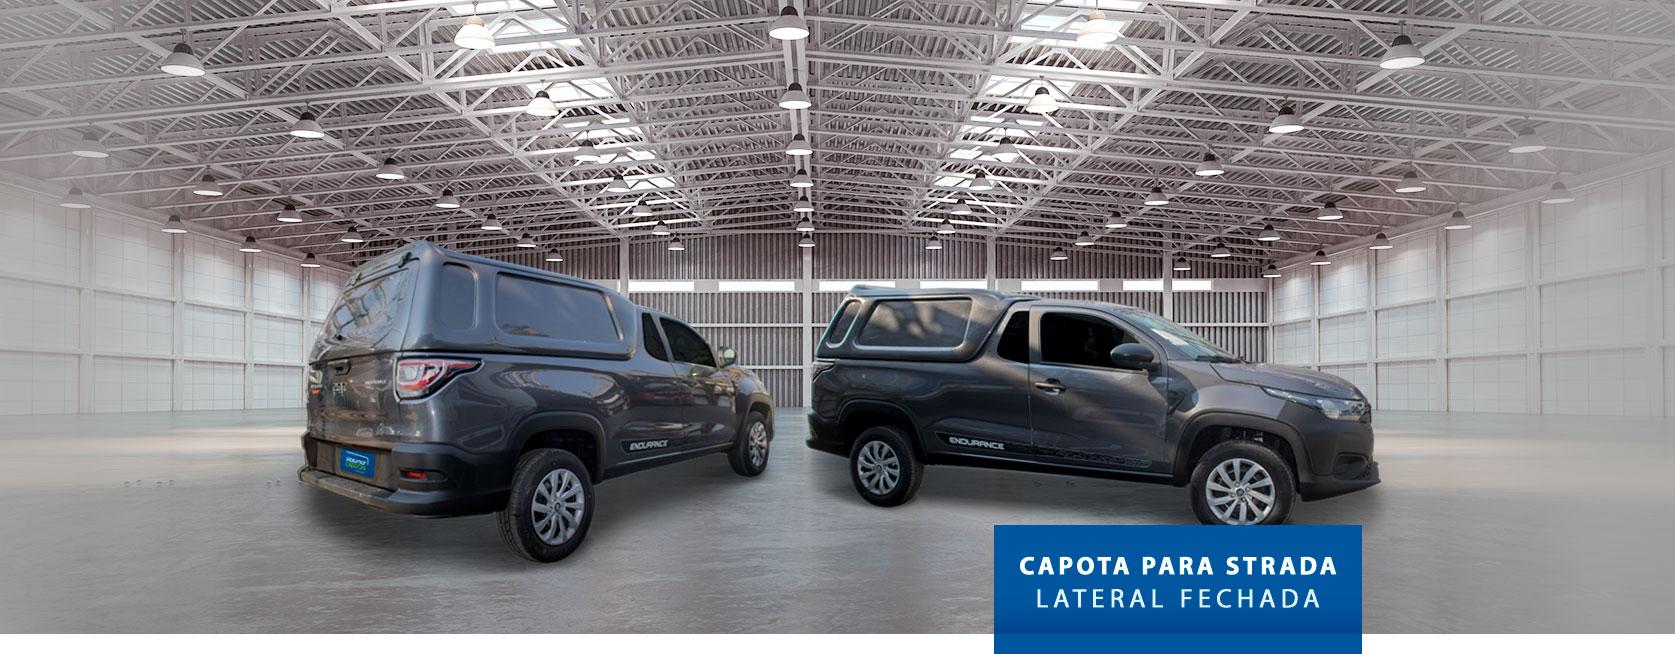 Lateral Fechada - Capota de Fibra Fiat Strada 2020/21